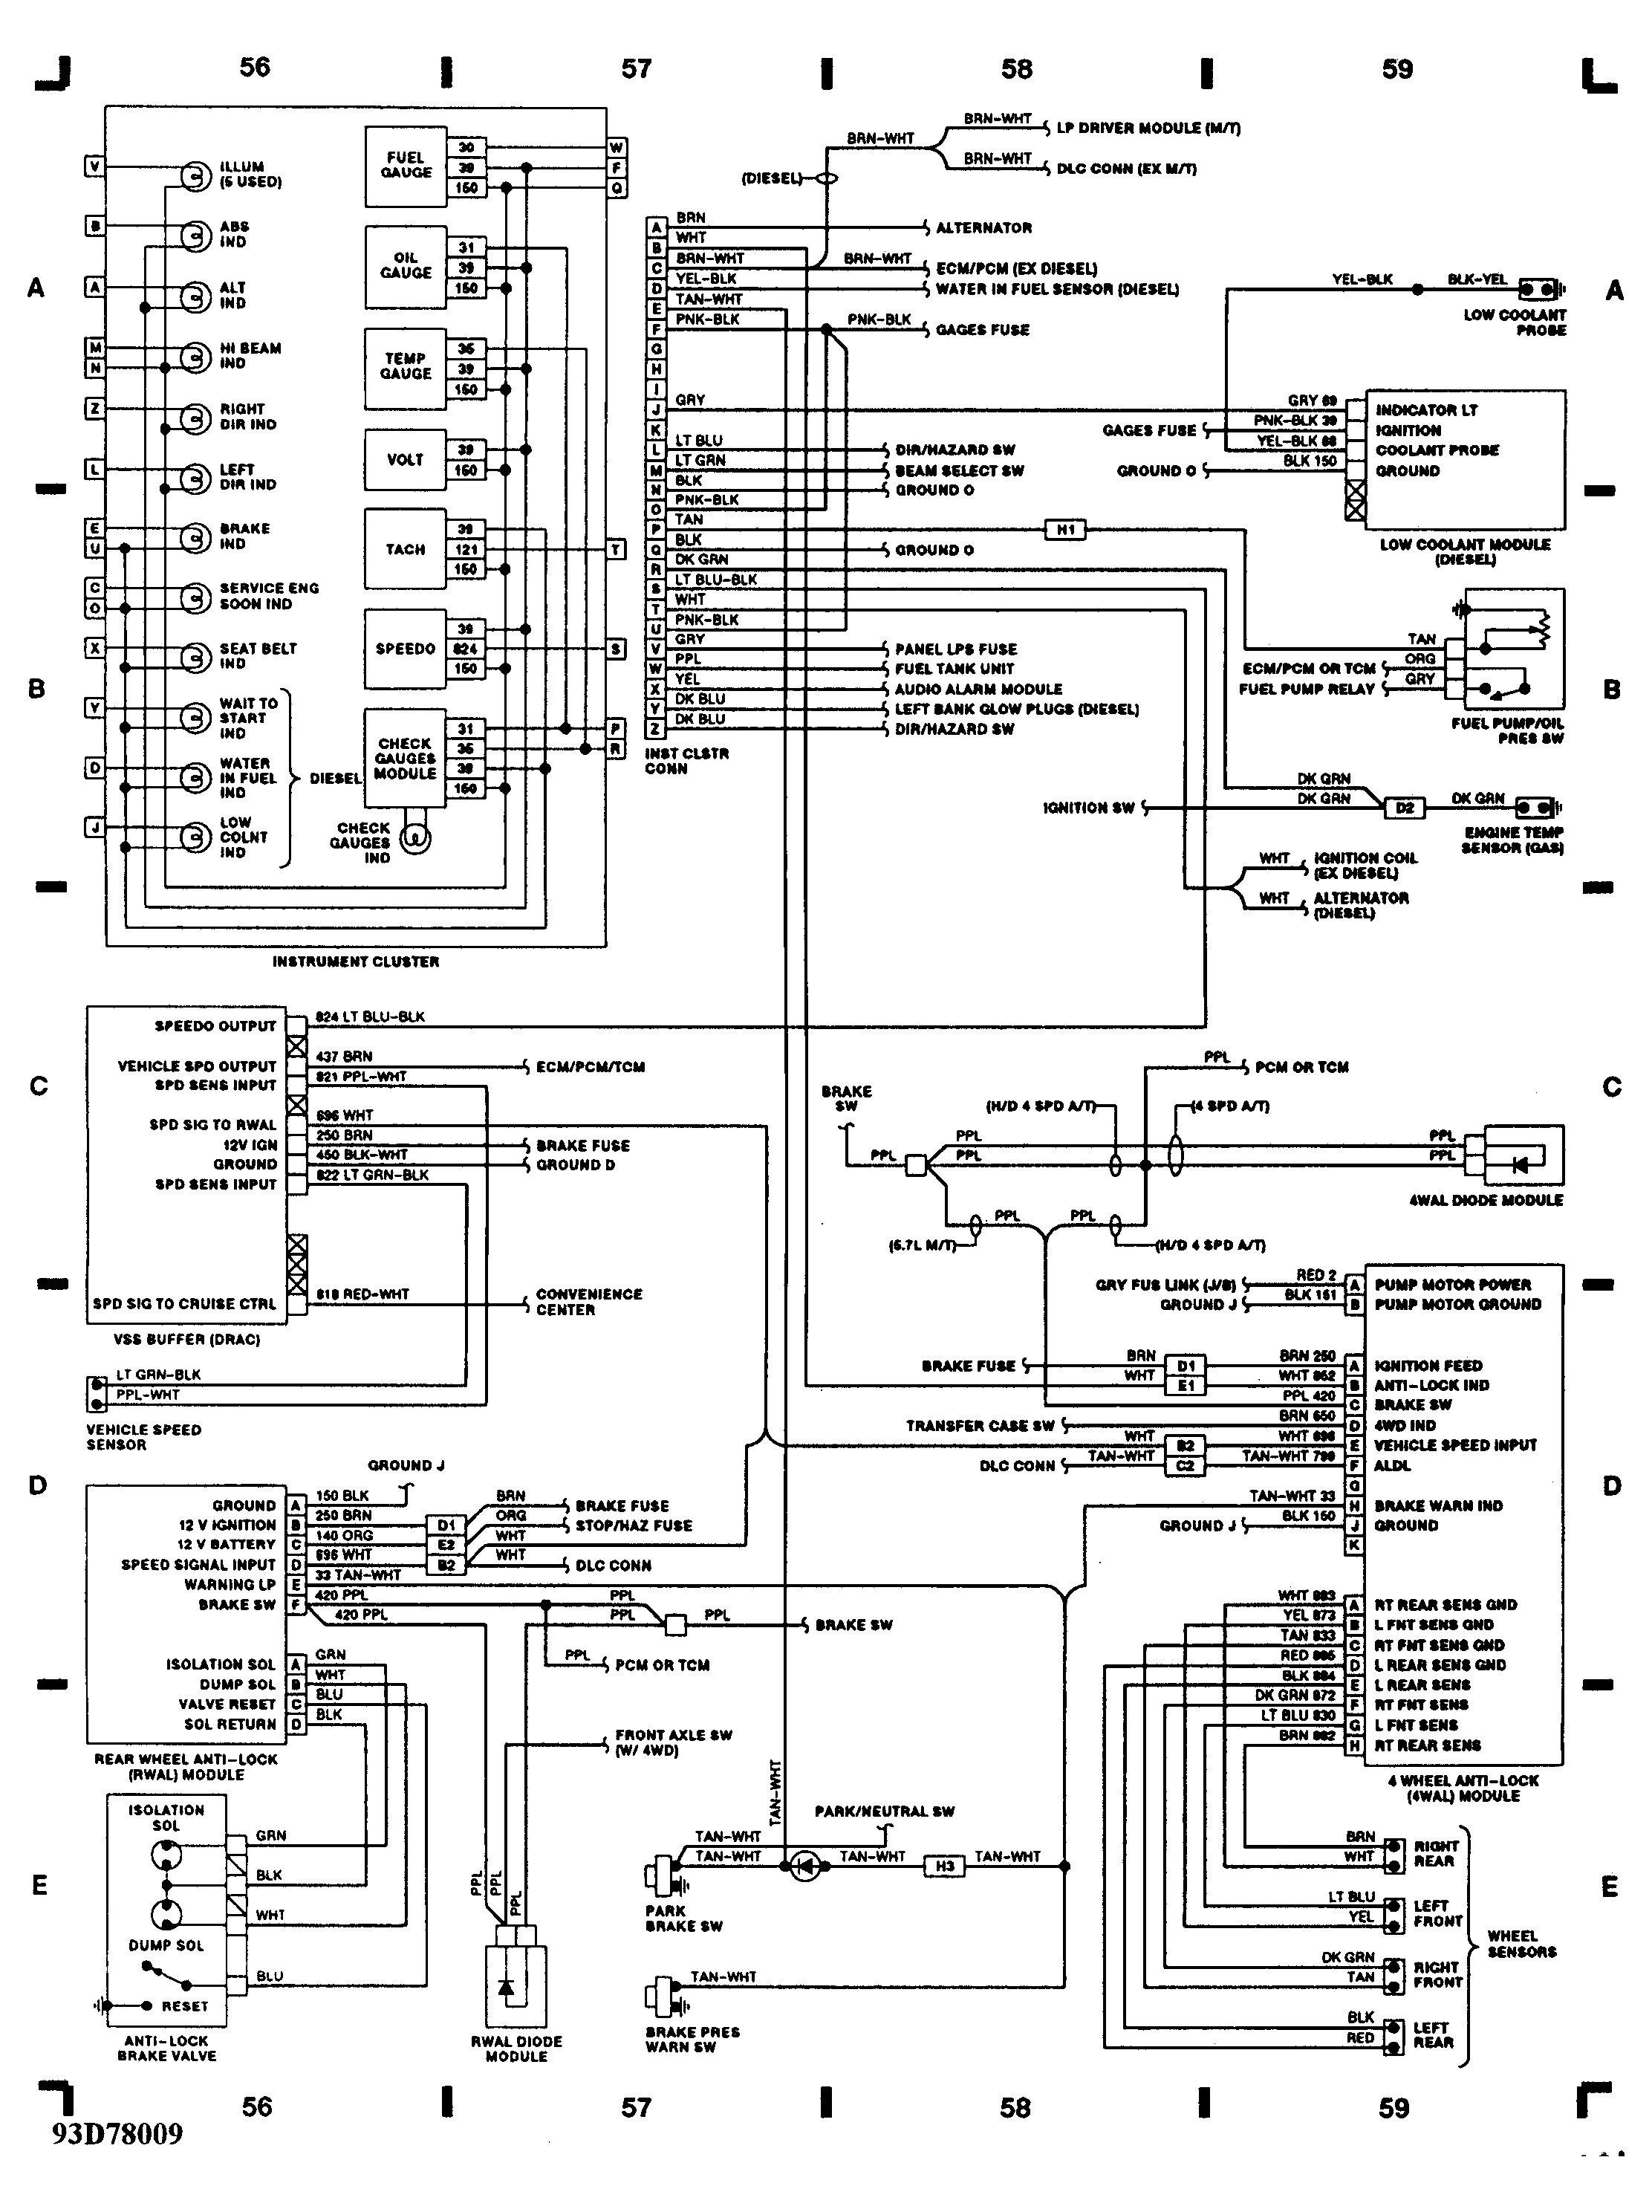 2001 ford windstar engine diagram my wiring diagram. Black Bedroom Furniture Sets. Home Design Ideas